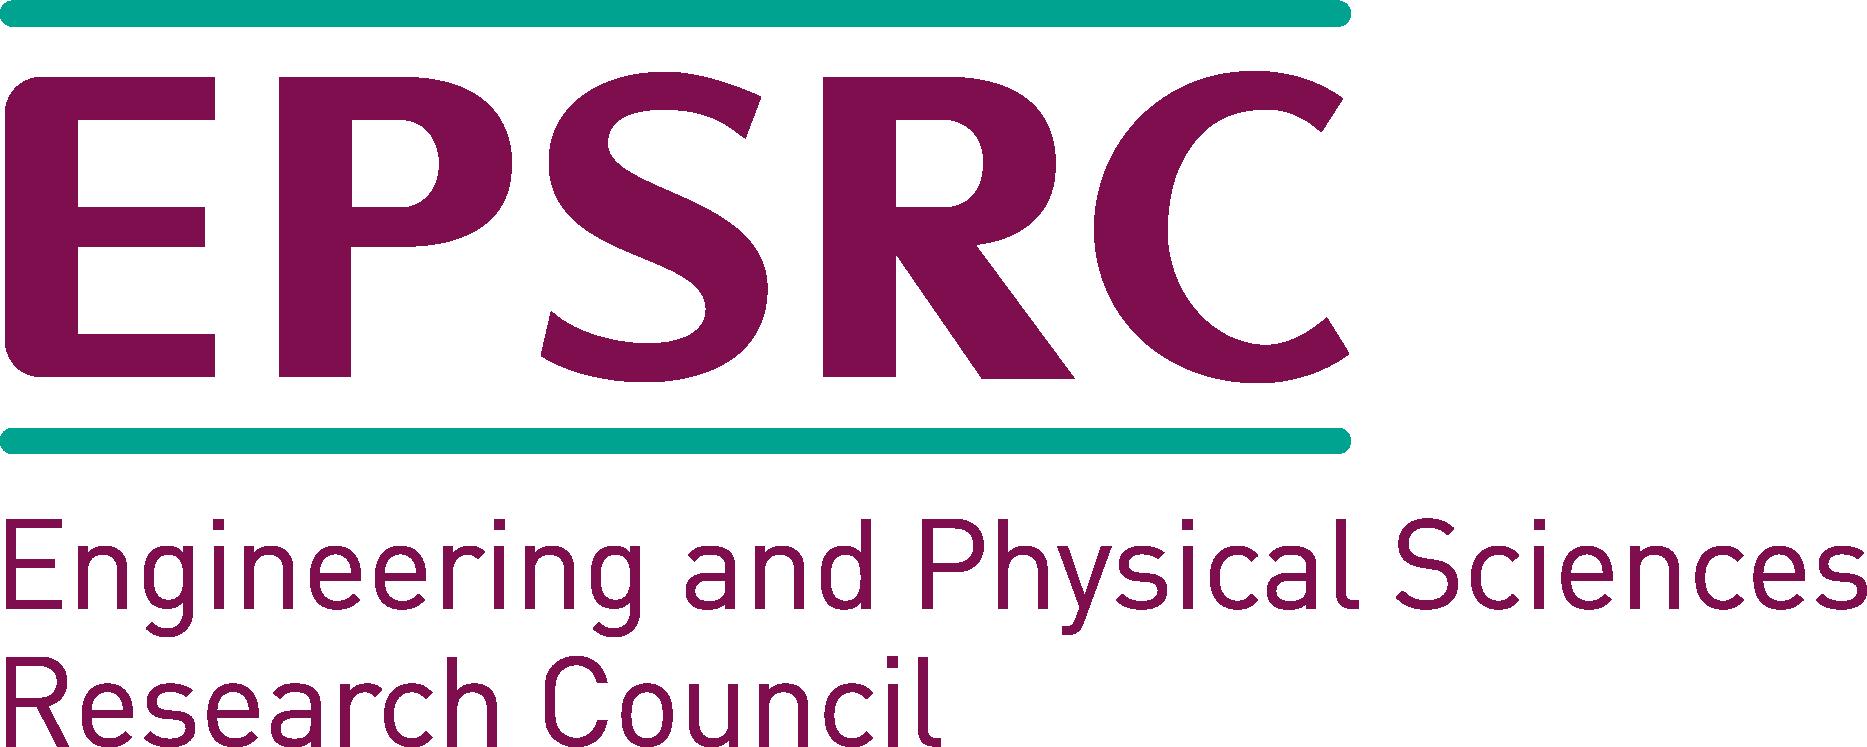 EPSRC New Logo